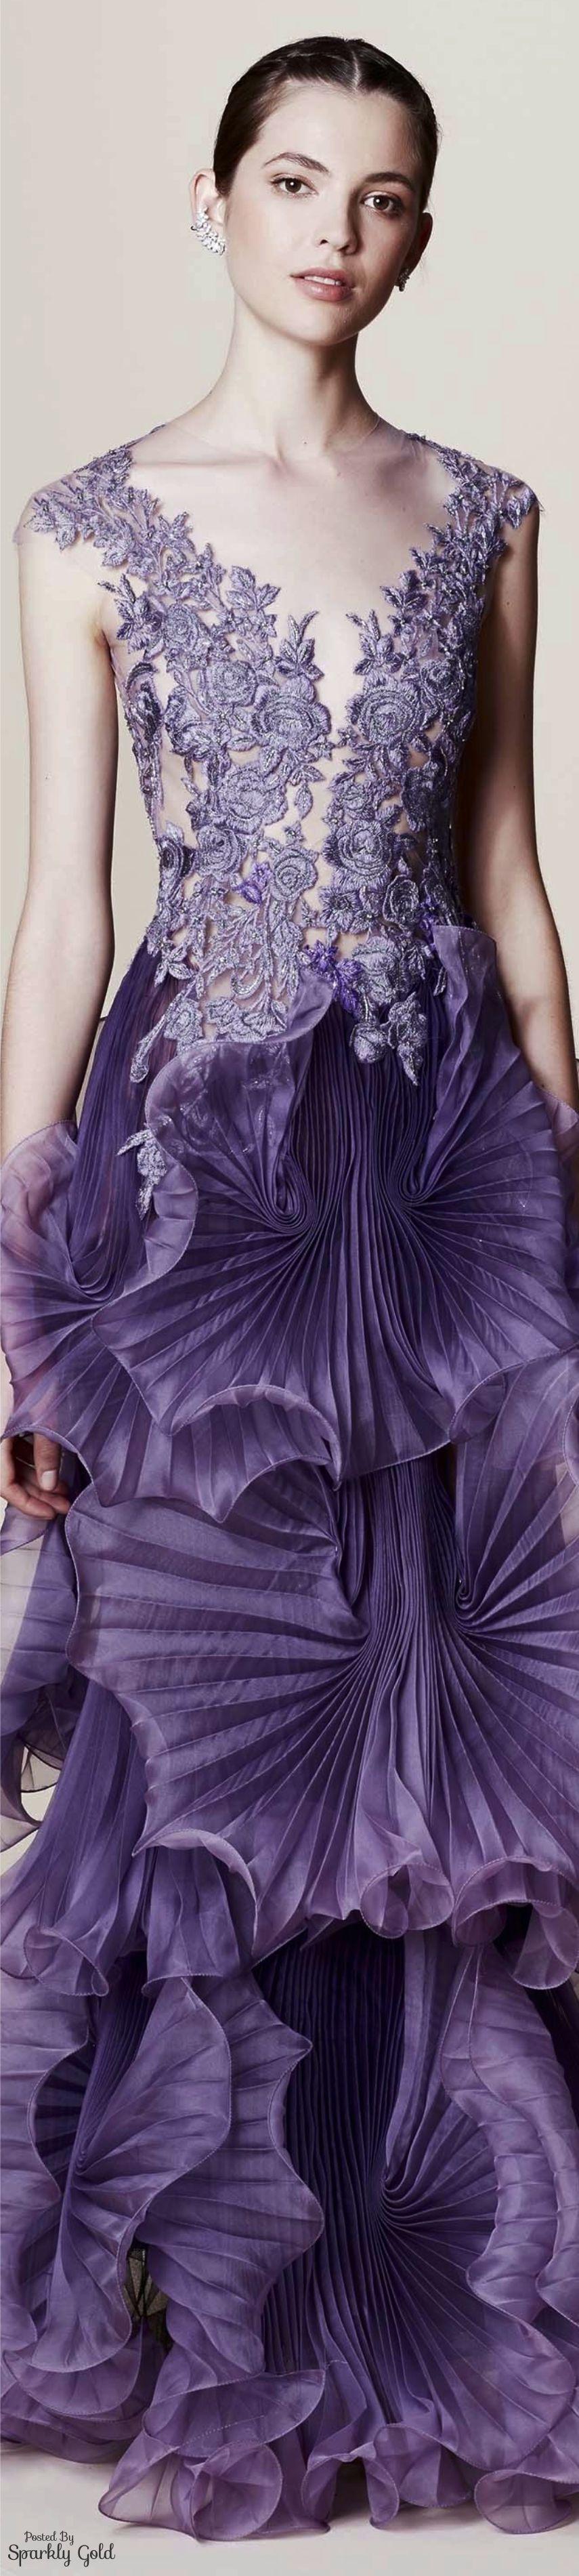 Marchesa Resort 2017 | fashion | Pinterest | Lilas, Morado lila y ...